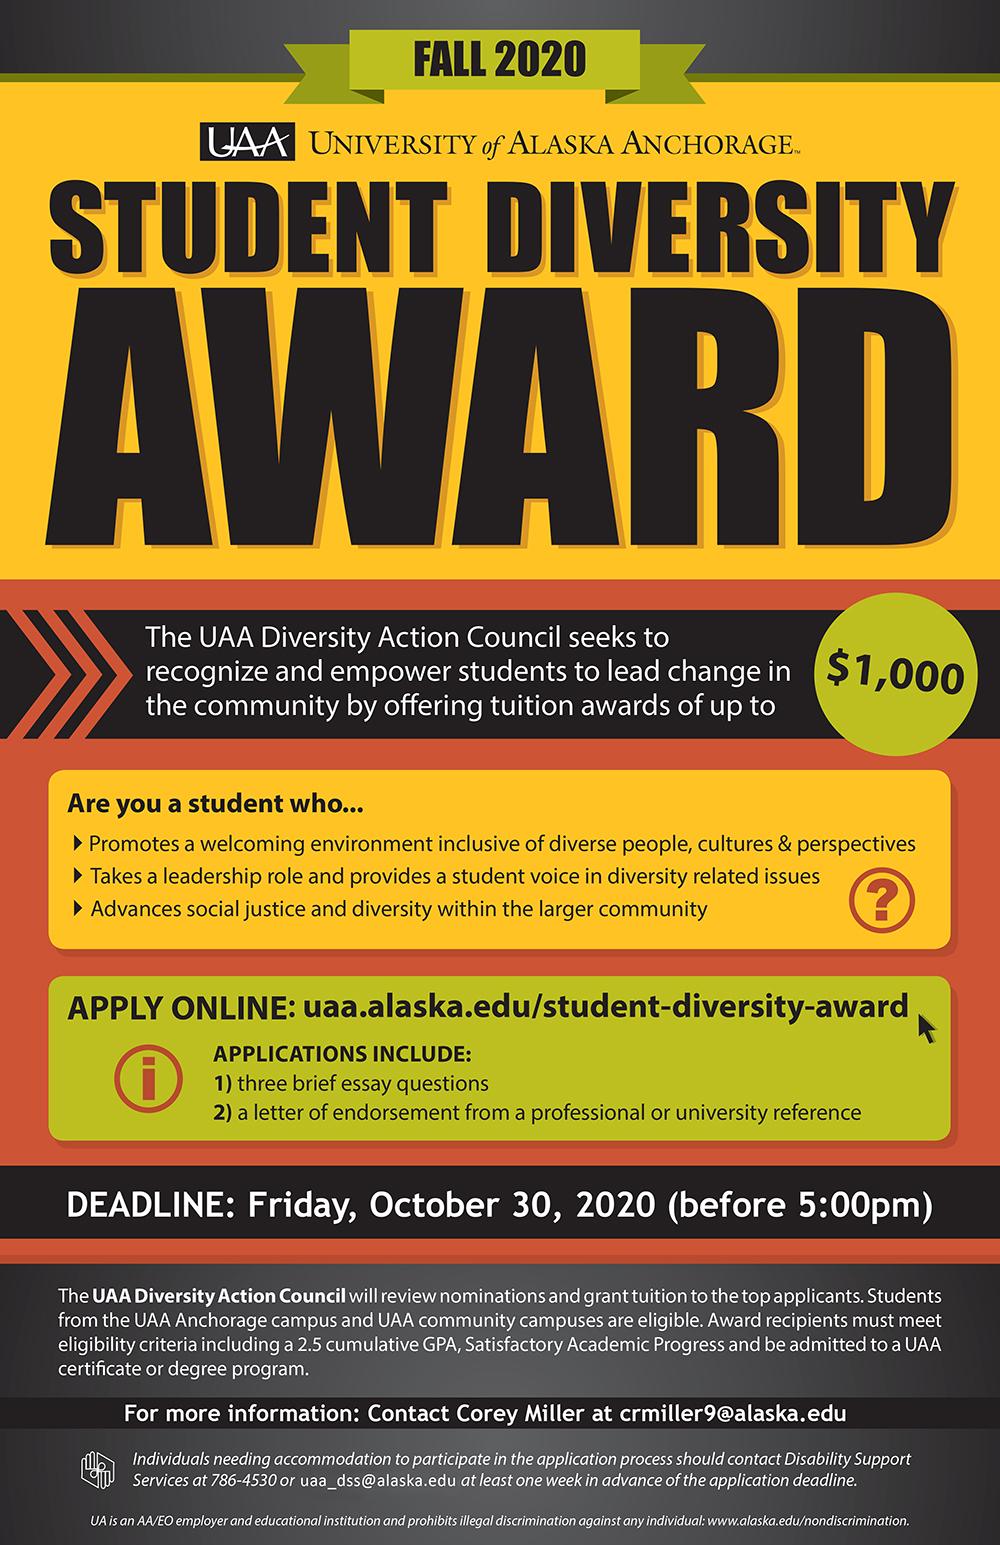 2020 Student Diversity Award poster